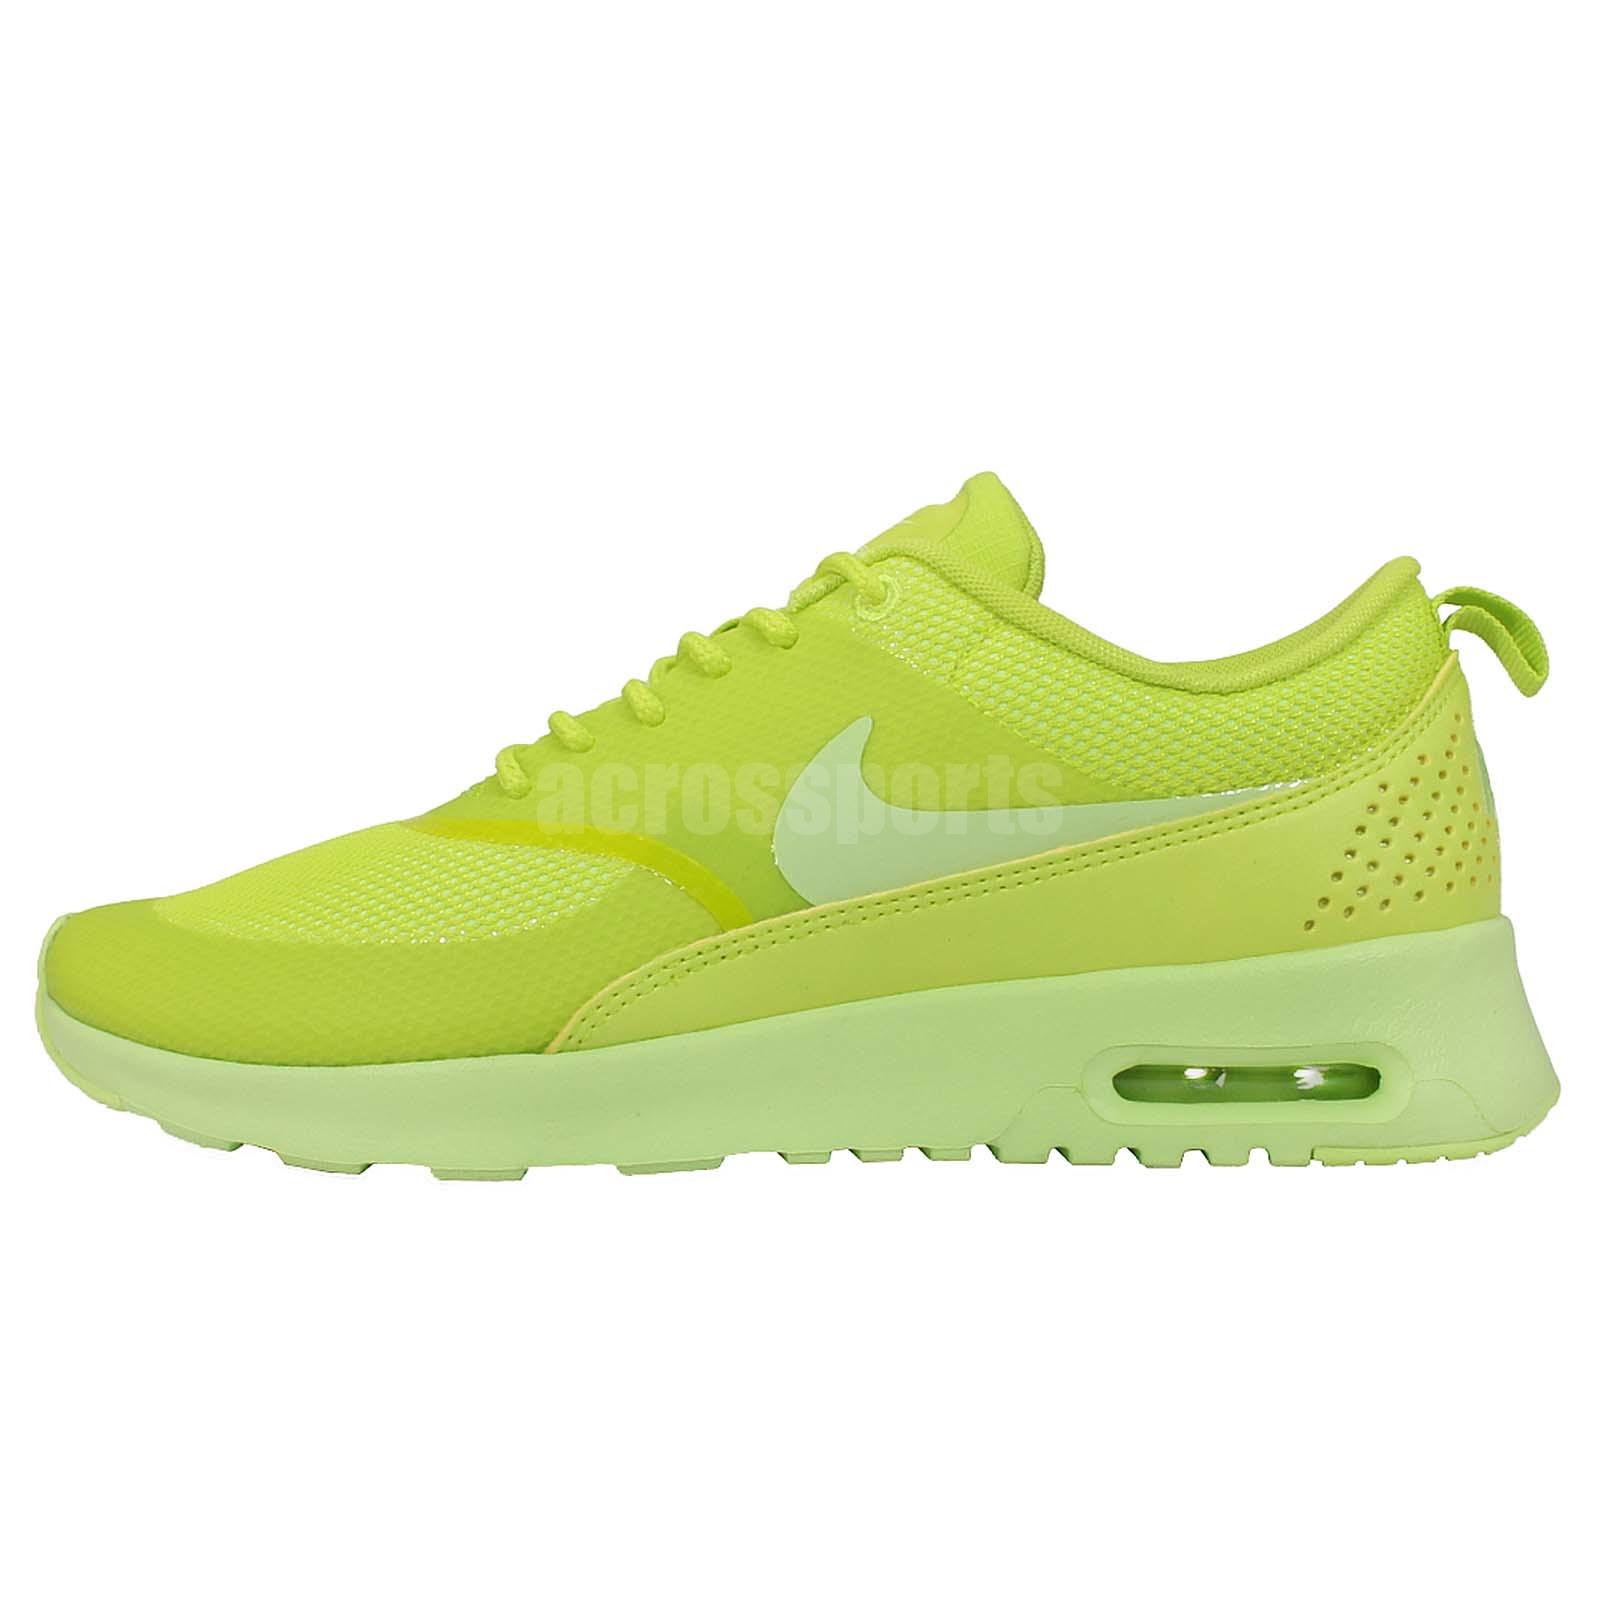 065b1d2e1d80 Now Nike Dualtone Racer. lime green air max size 6.5